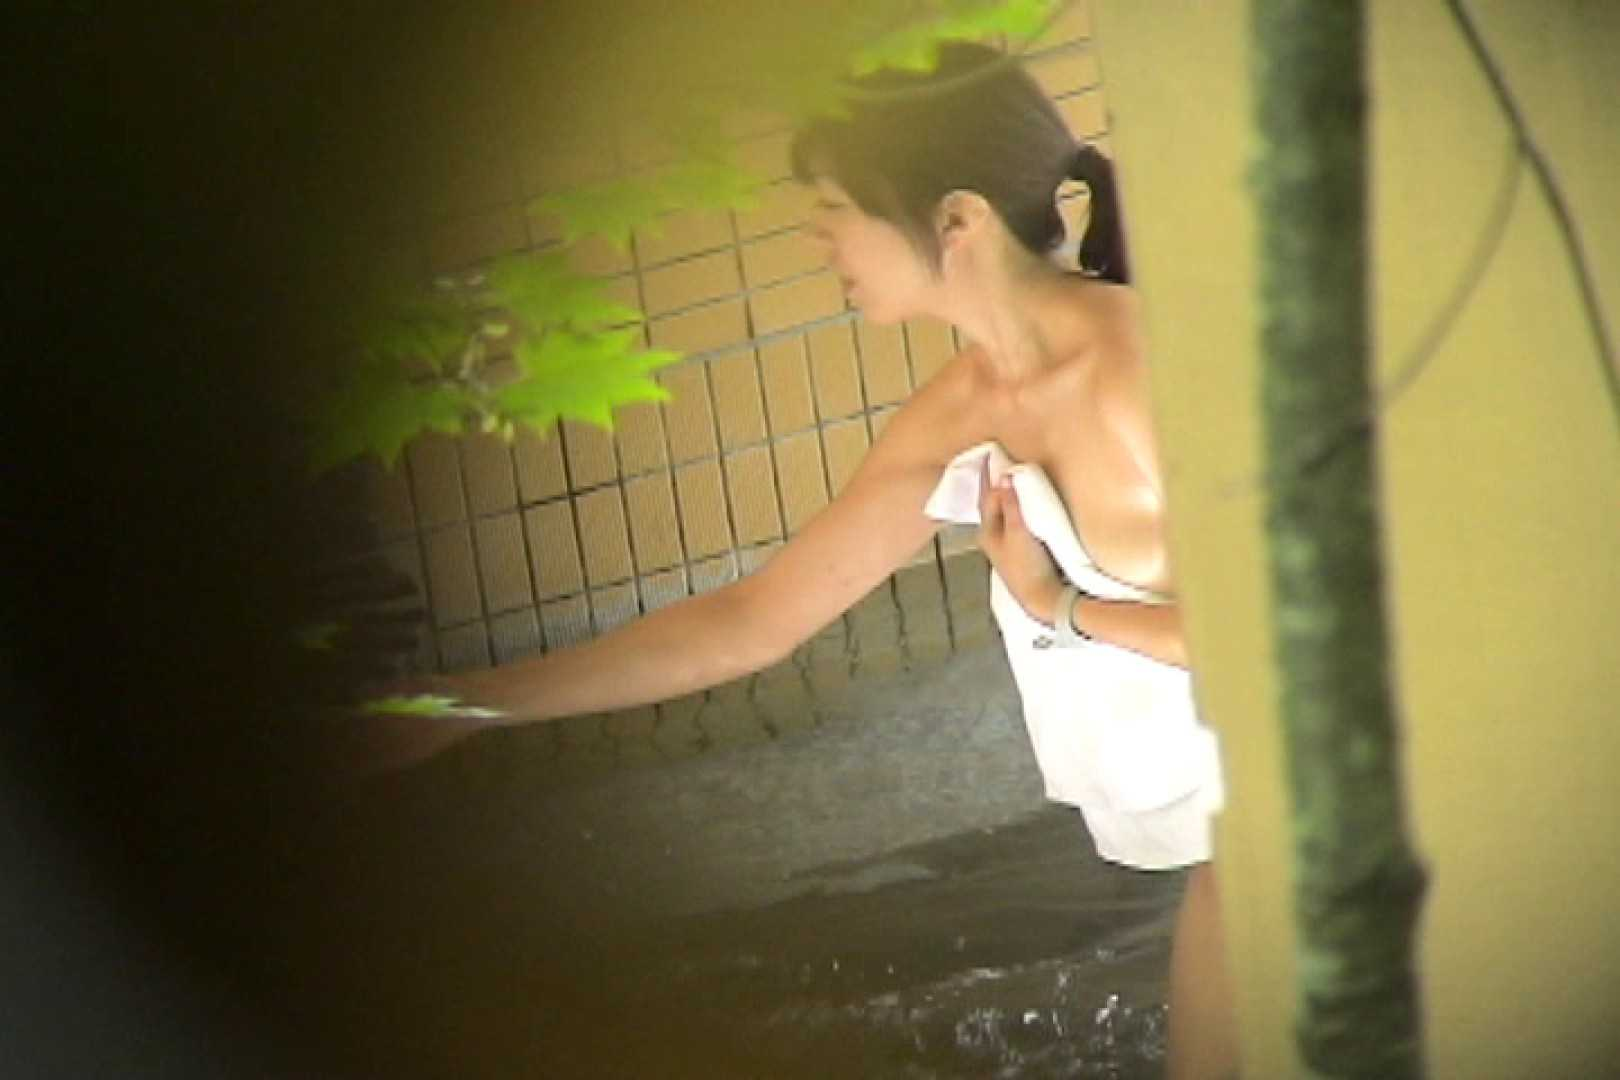 Aquaな露天風呂Vol.703 0 | 0  57連発 27